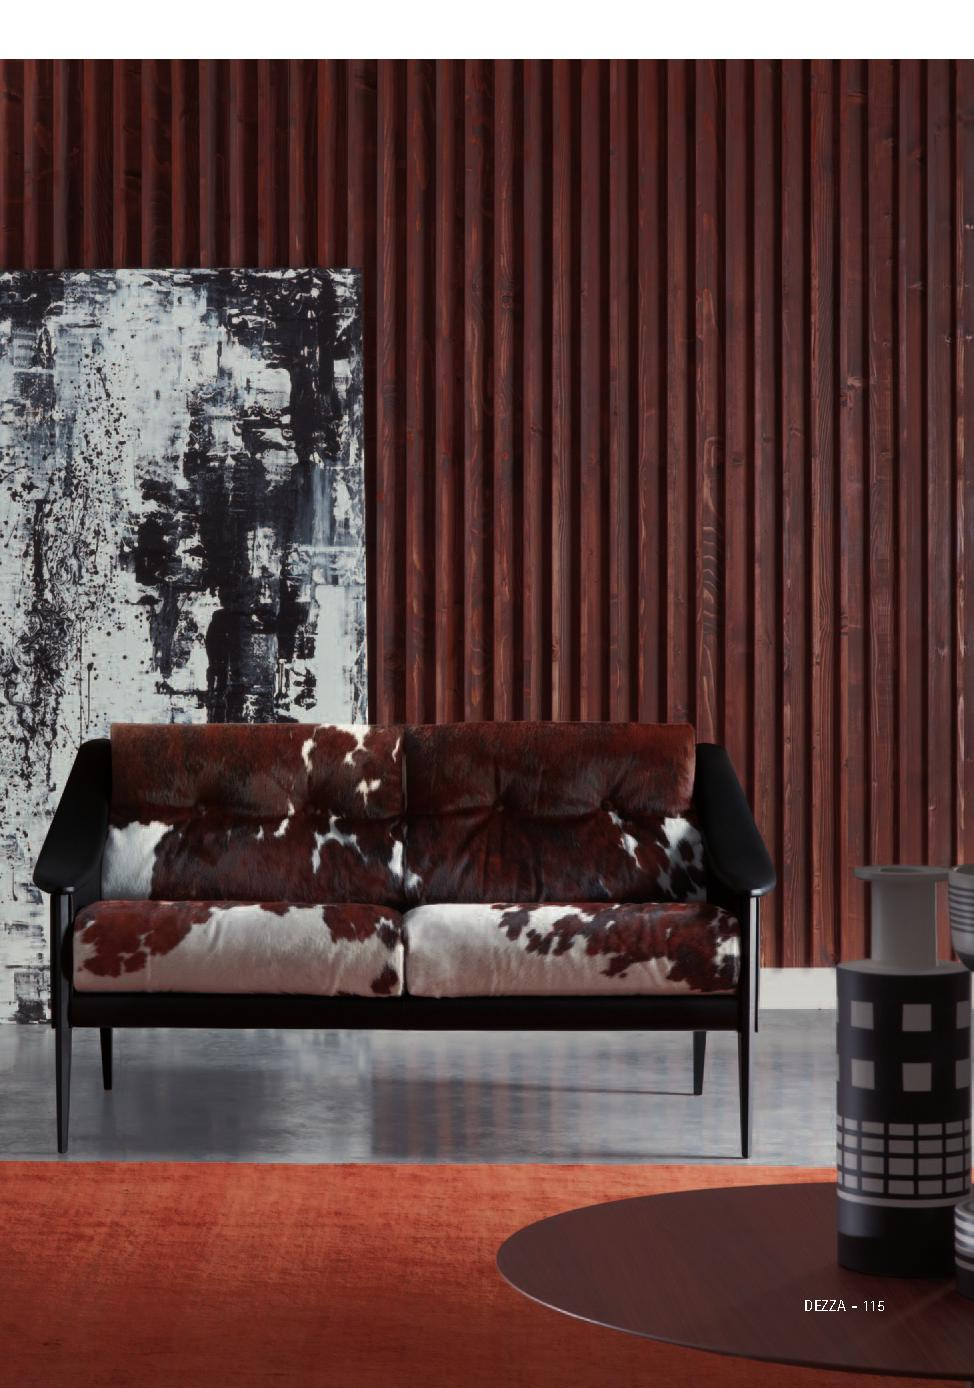 Poltrona Frau-现代轻奢休闲沙发